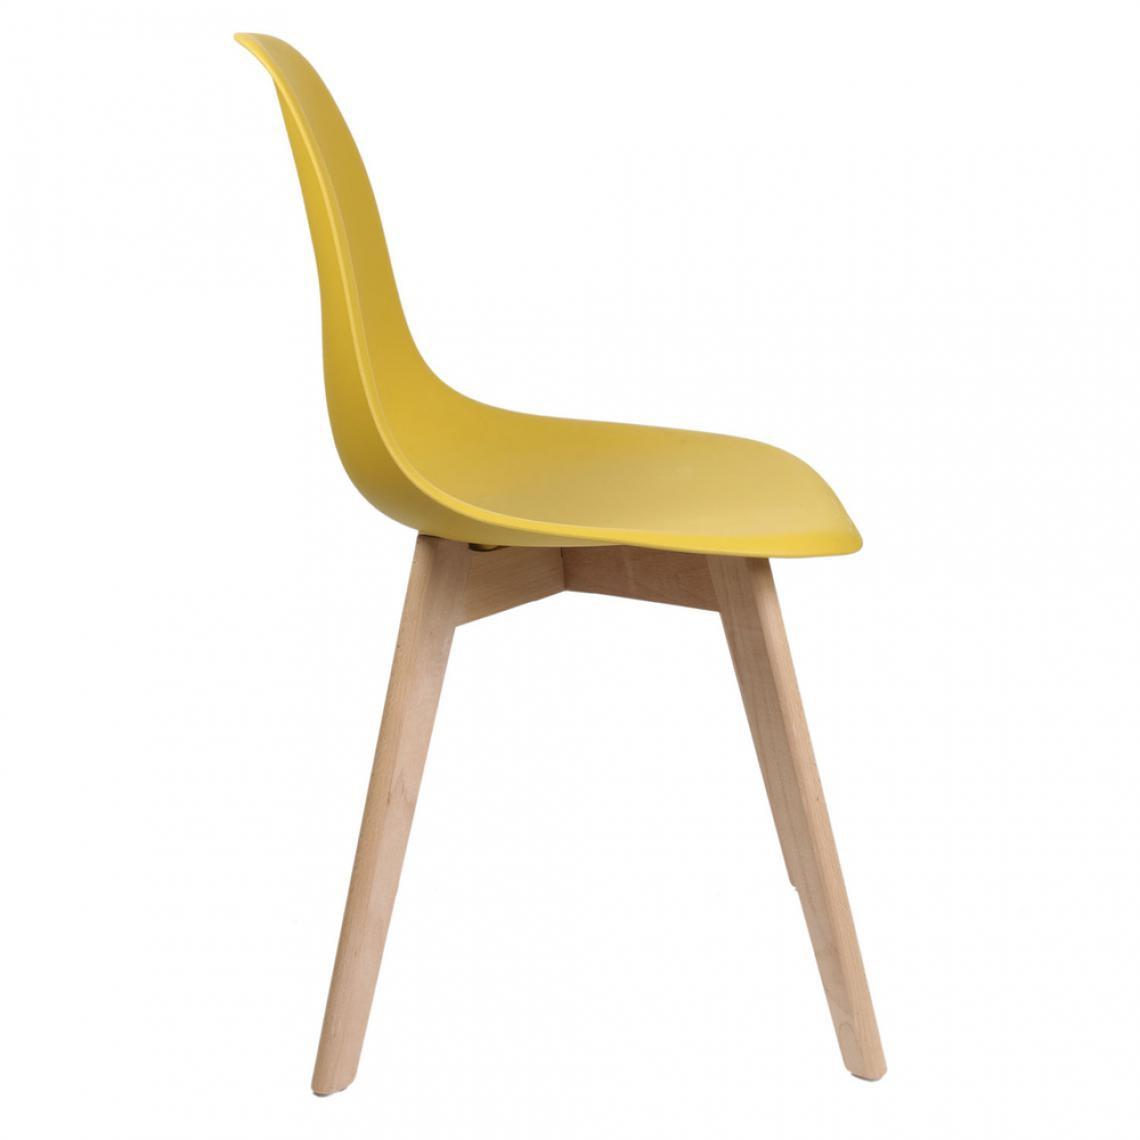 chaise scandinave jaune vadsa 3 suisses